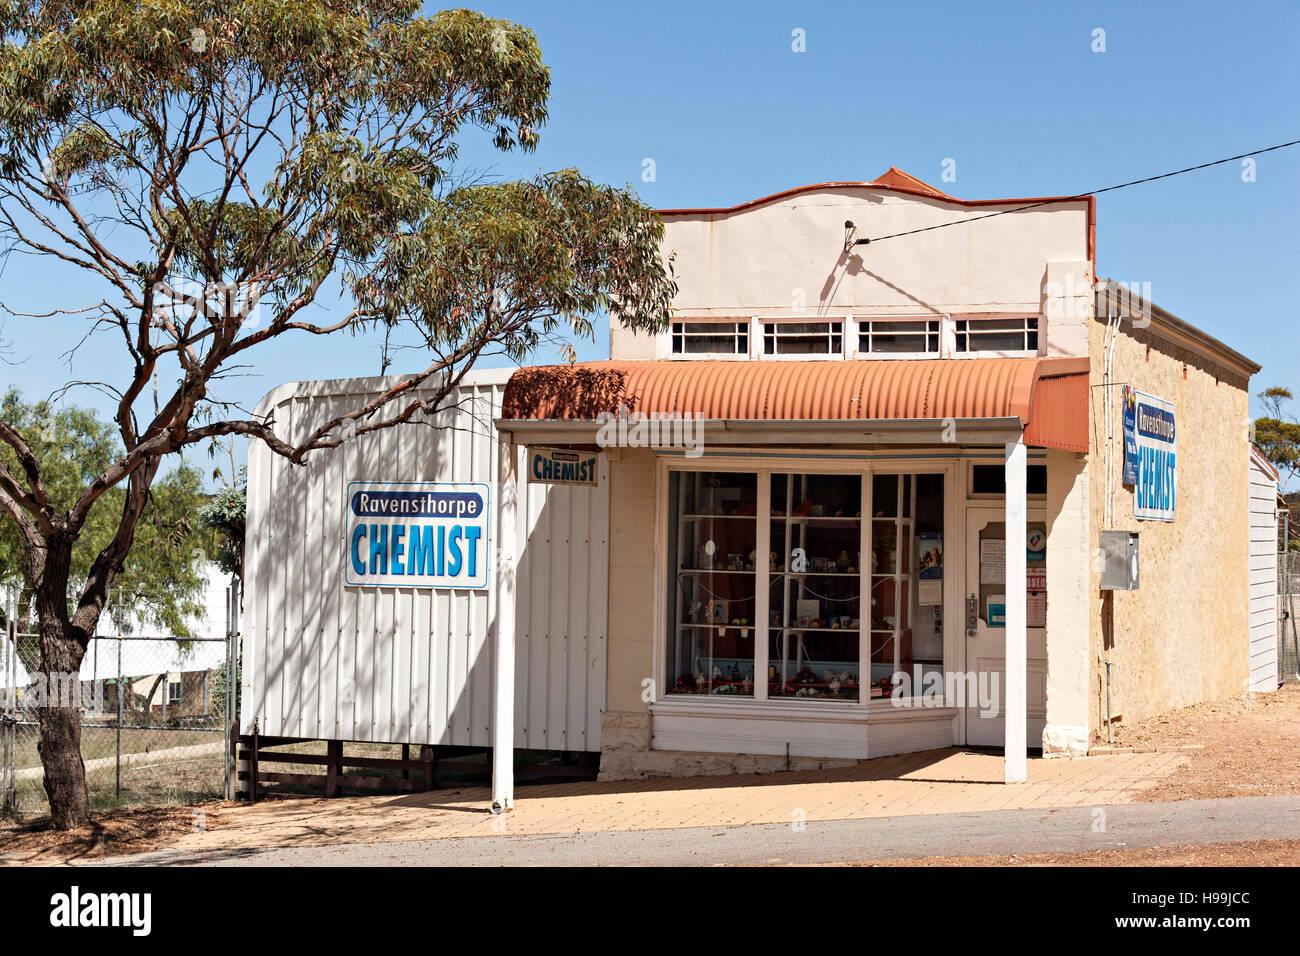 Small outback town Chemist Shop, Ravensthorpe Western Australia - Stock Image